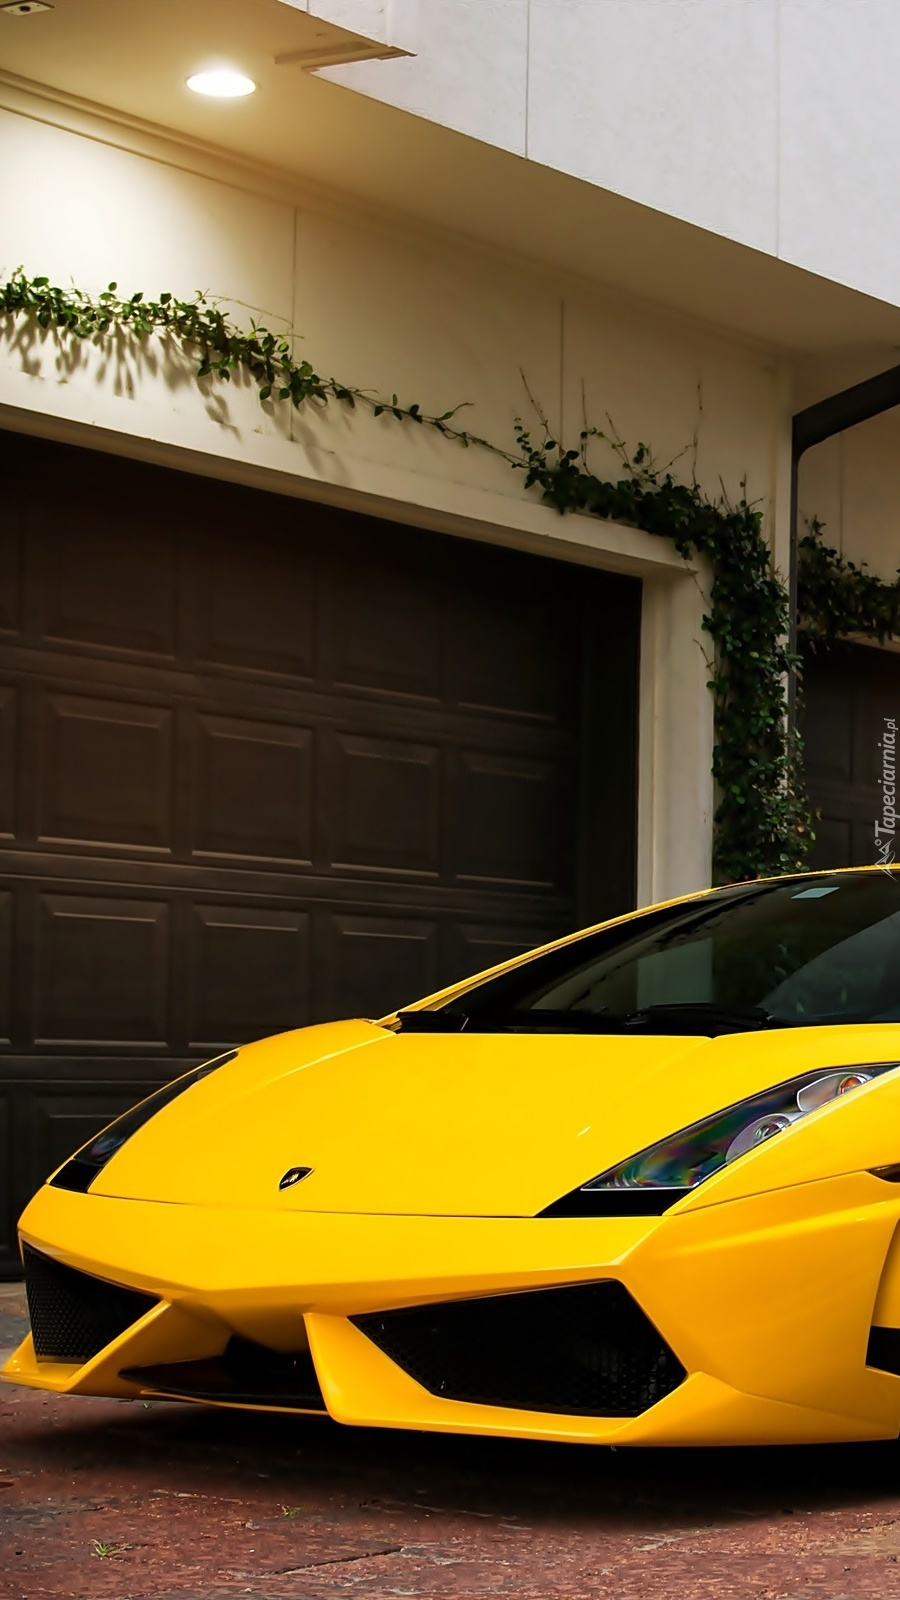 Przód  Żółtego Lamborghini Gallardo